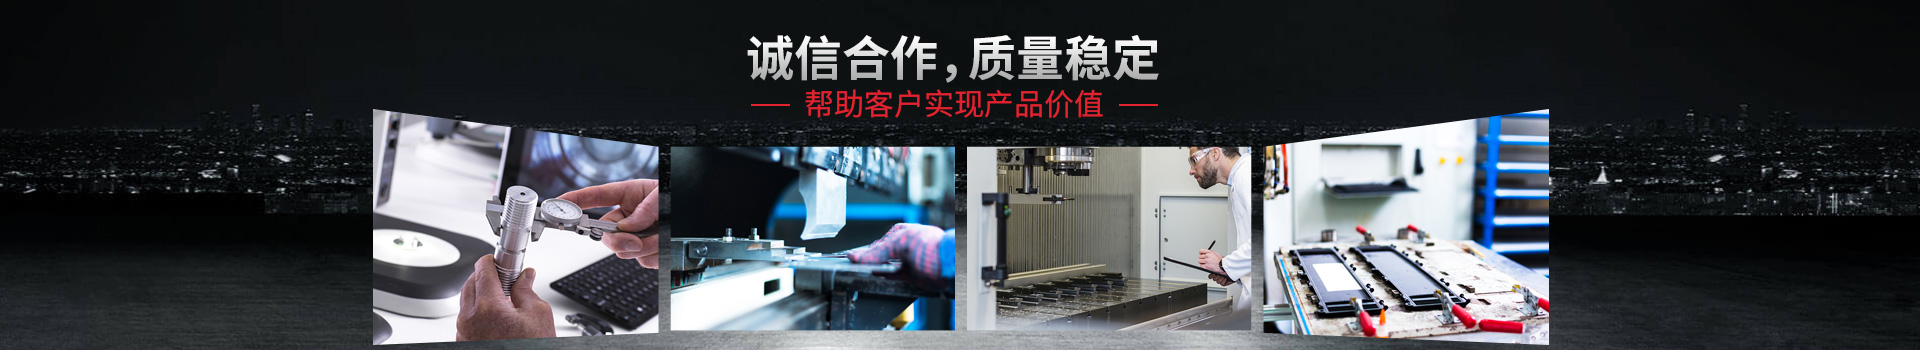 CNC精密機械加工,深圳CNC加工廠家——誠信合作,質量穩定